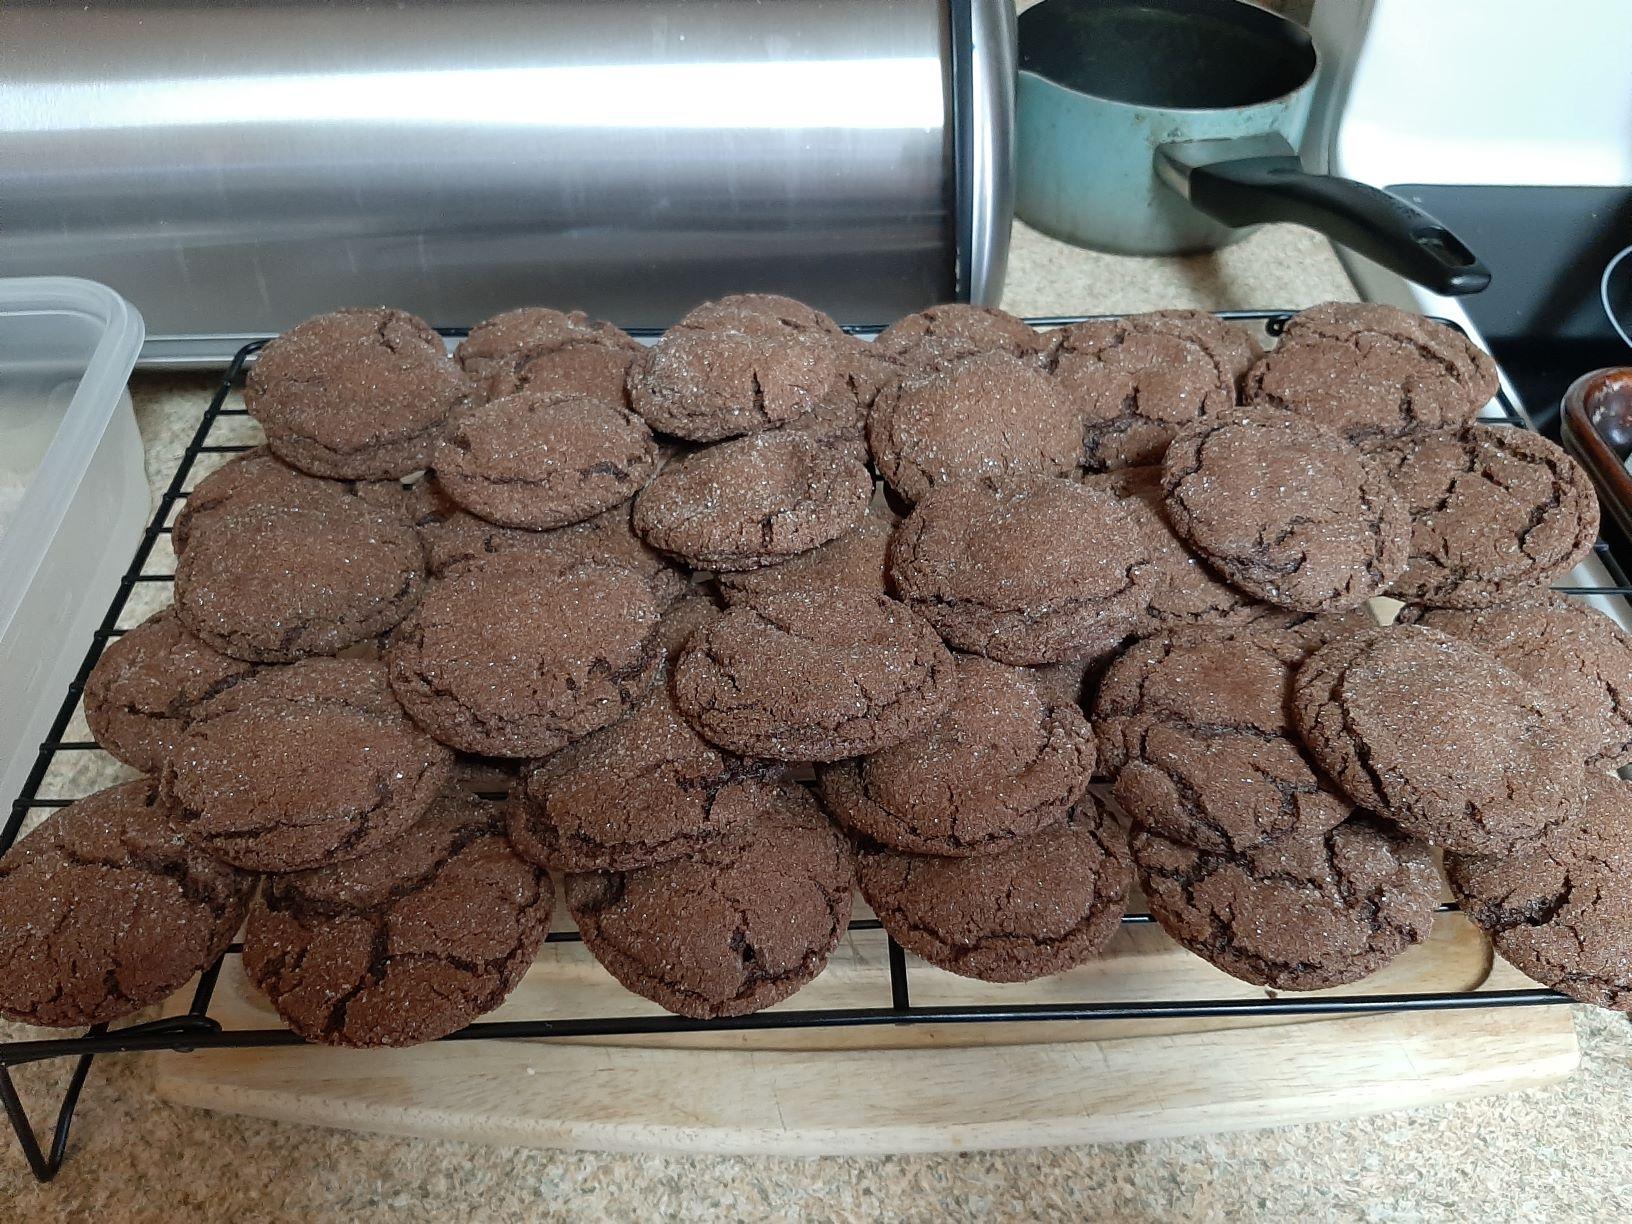 Chocolate Snickerdoodles sequoia04